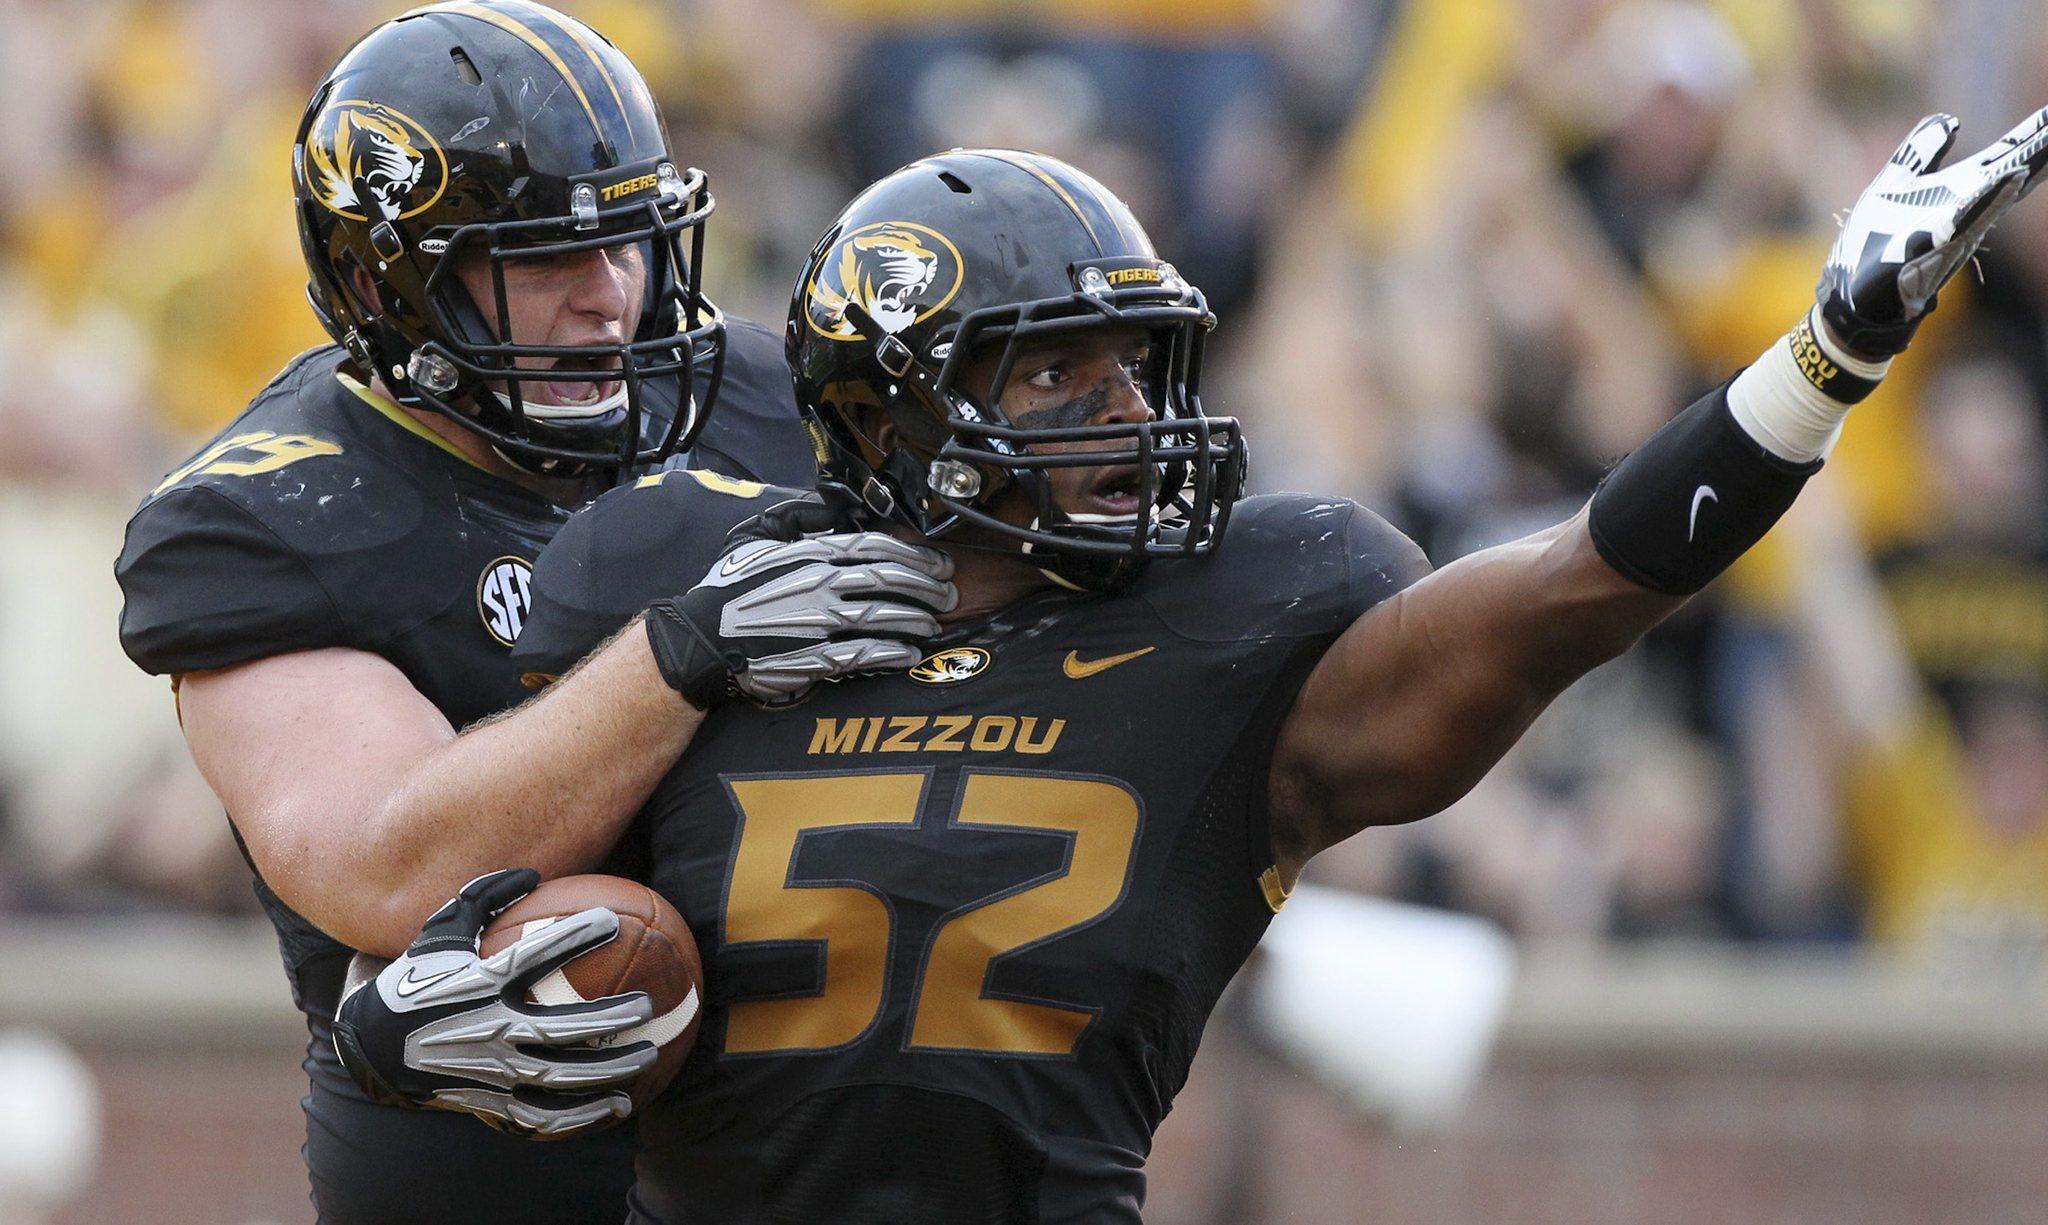 Missouri linebacker Michael Sam (52) is congratulated by teammate Matt Hoch after returning a fumble seven yards for a touchdown.